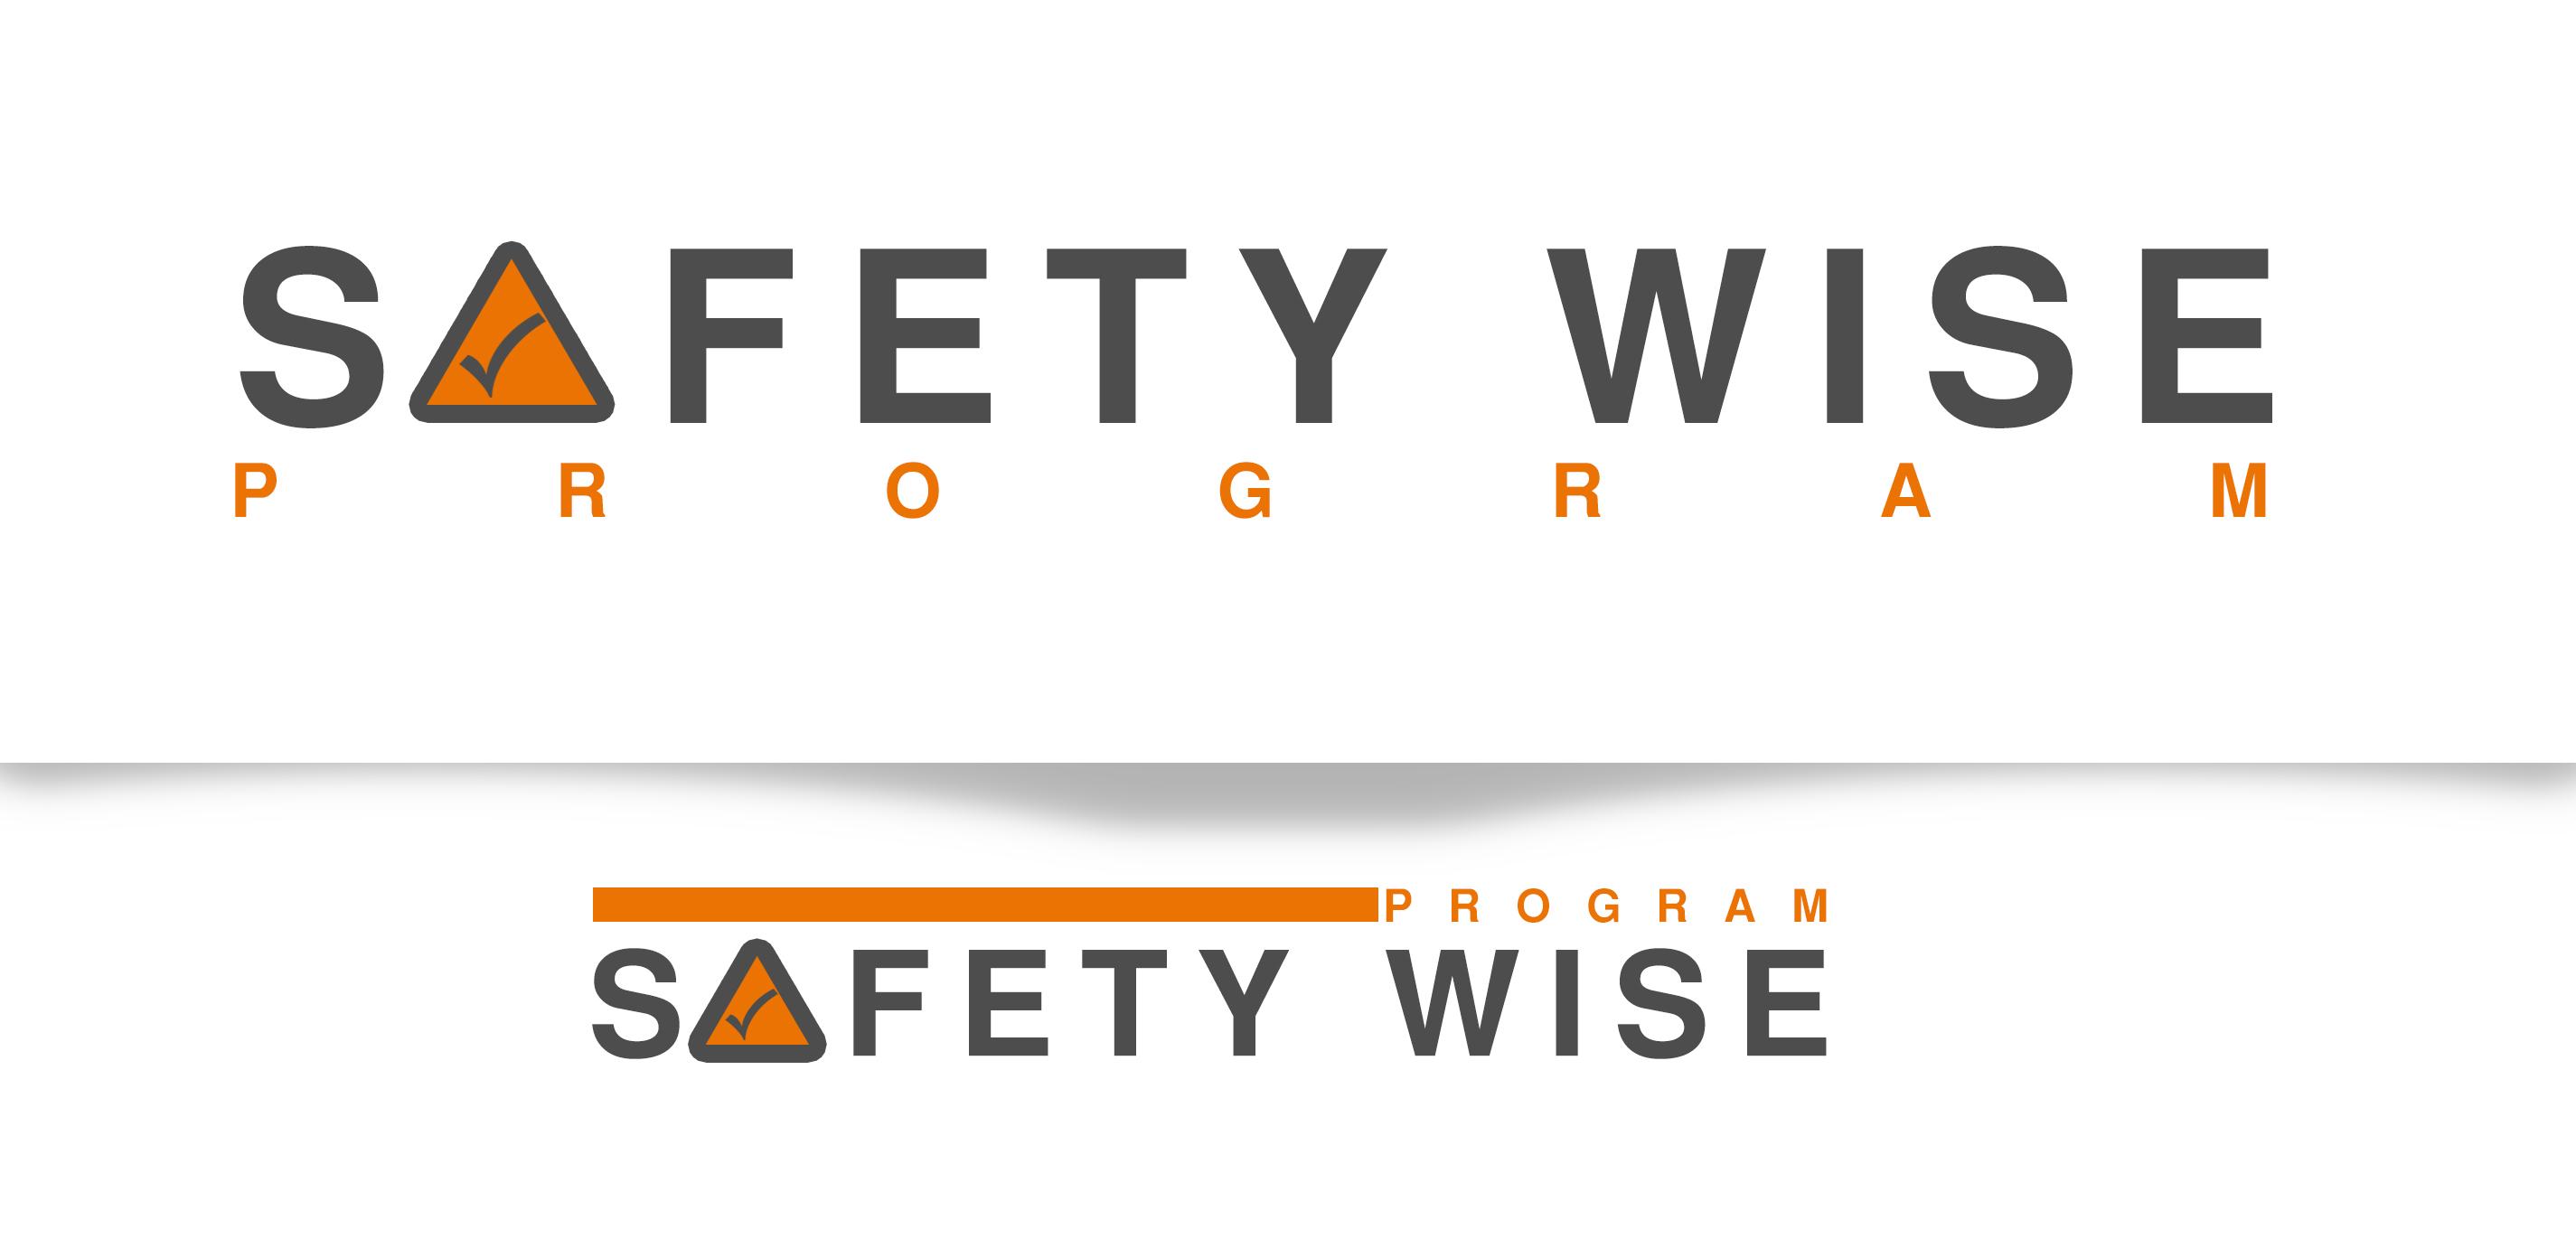 Logo Design by JSDESIGNGROUP - Entry No. 211 in the Logo Design Contest New Logo Design for Safety Wise Program.